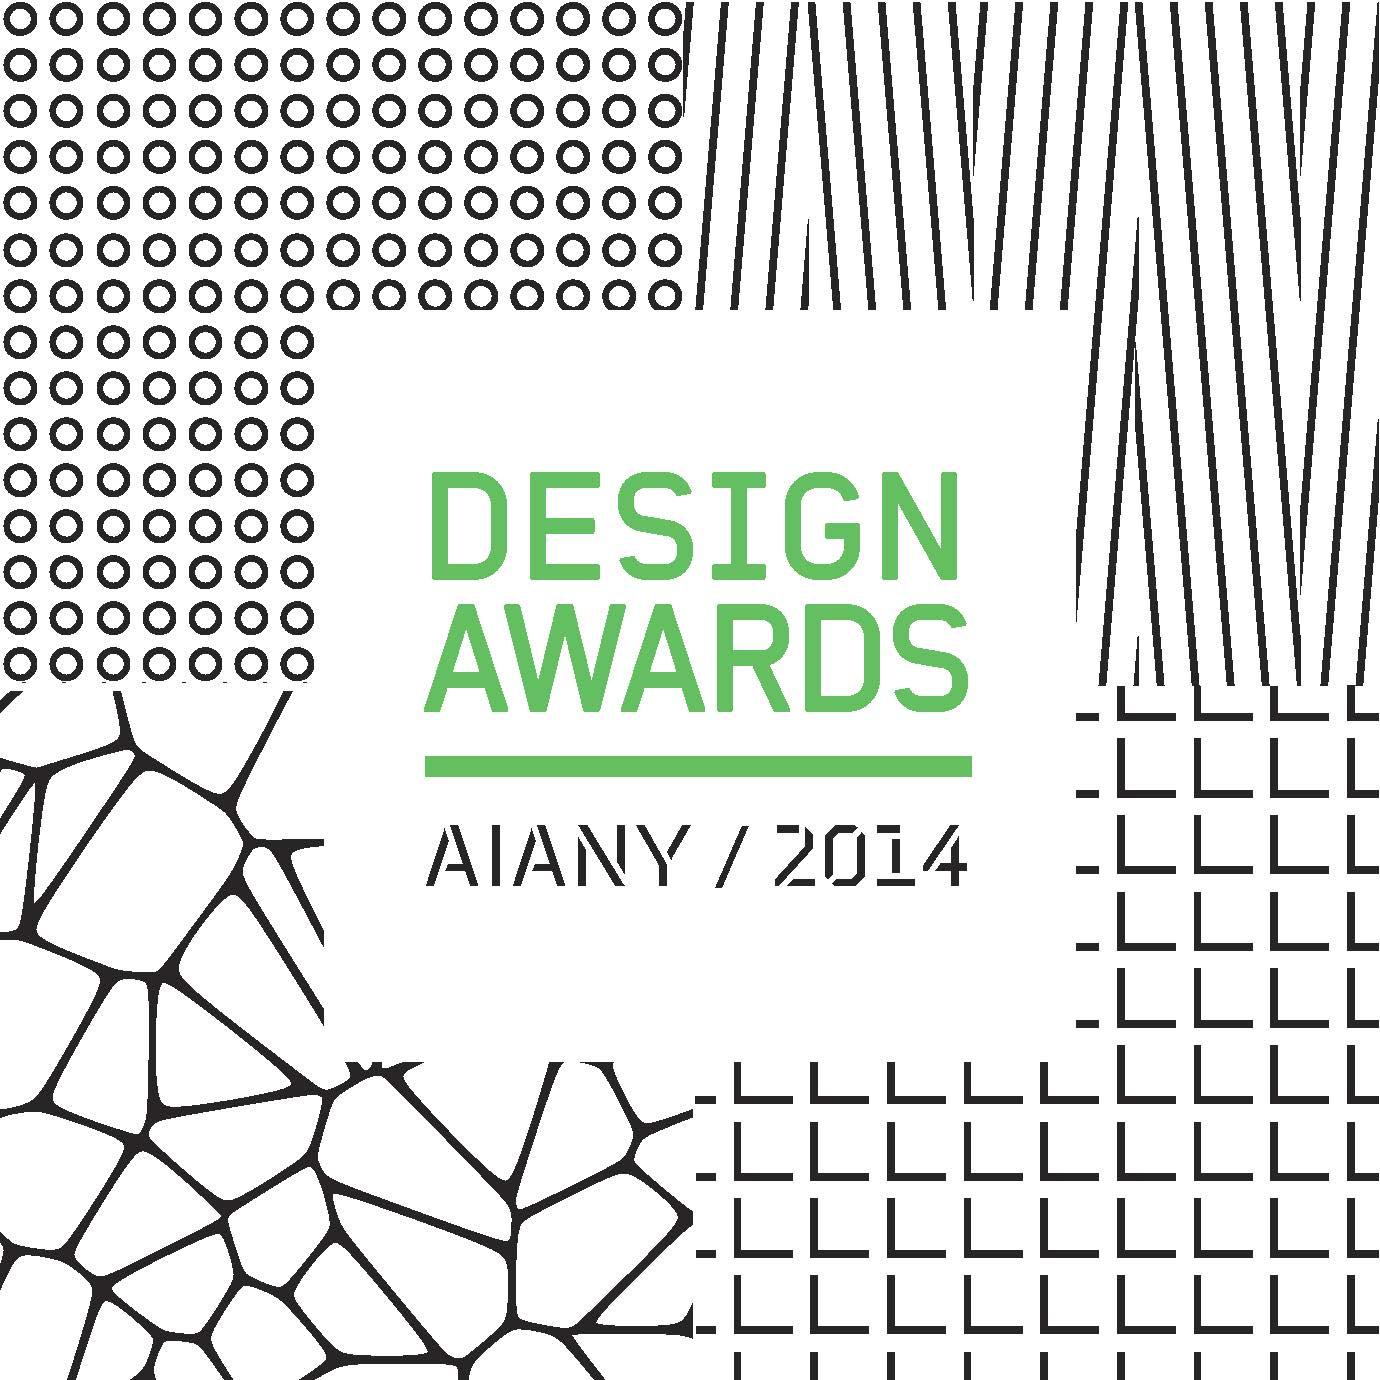 AIANY 2014 Design Awards